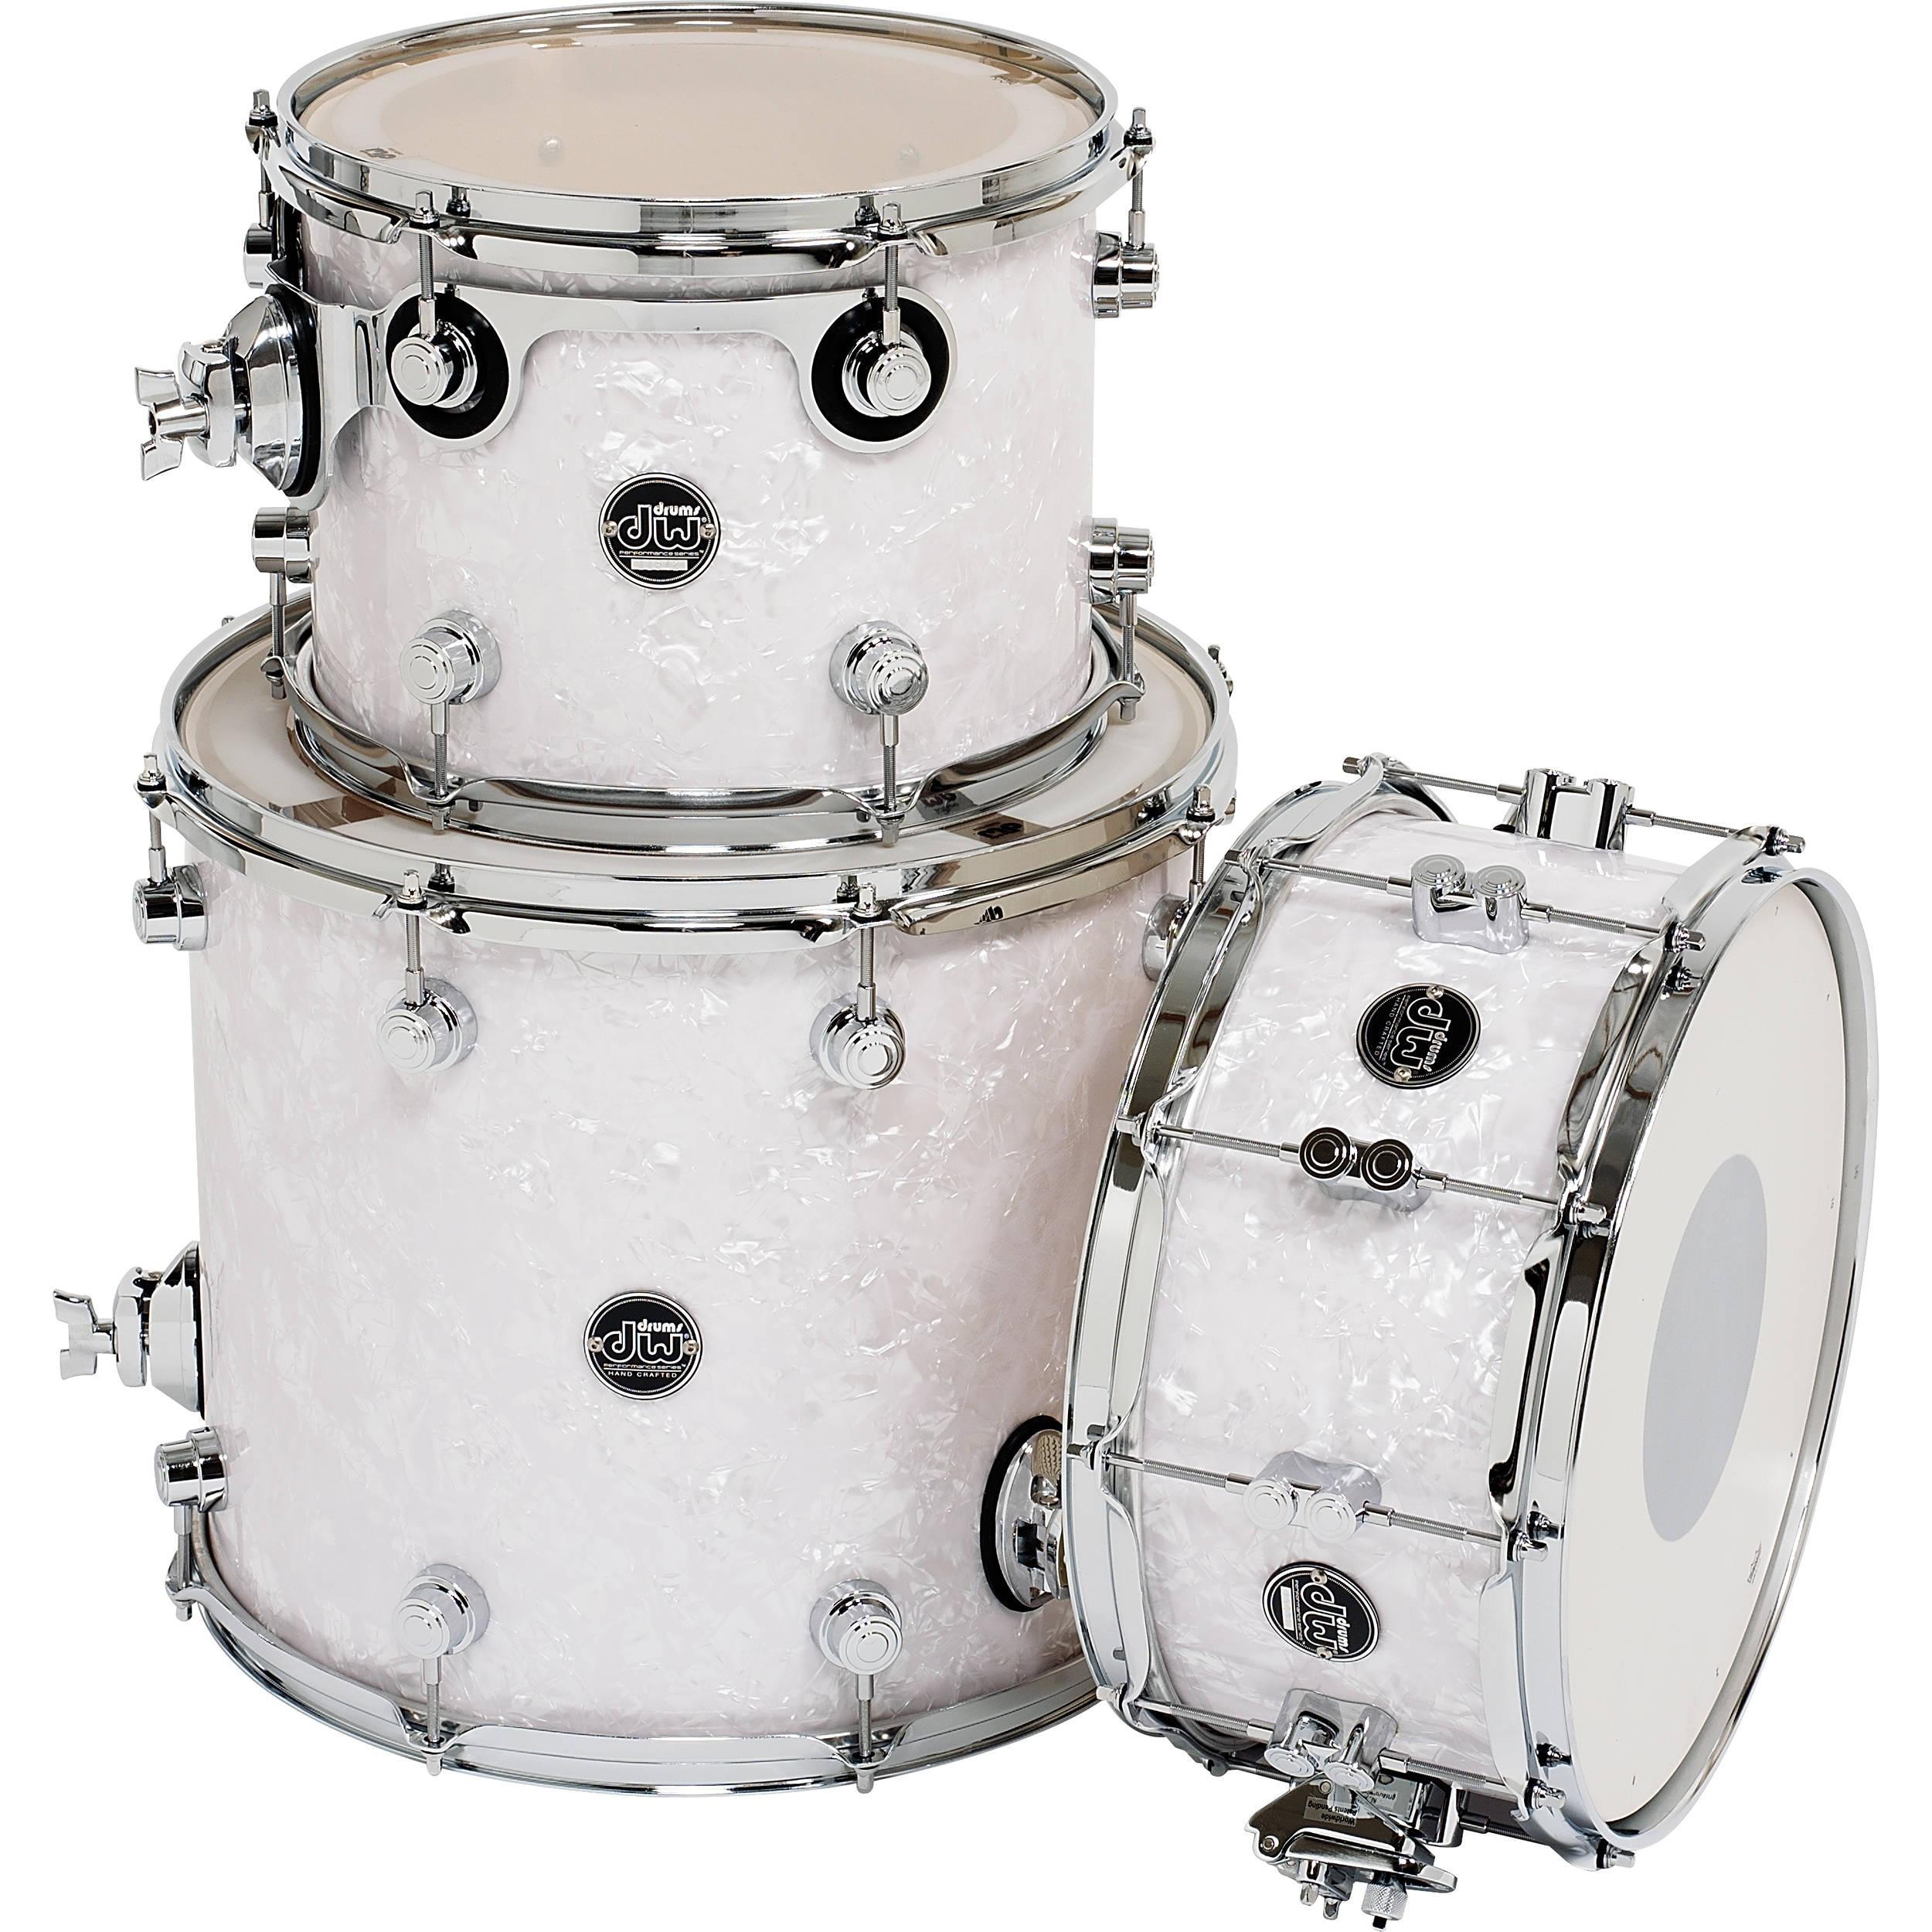 dw drums performance series 3 piece tom snare drum drpftmpk03wm. Black Bedroom Furniture Sets. Home Design Ideas